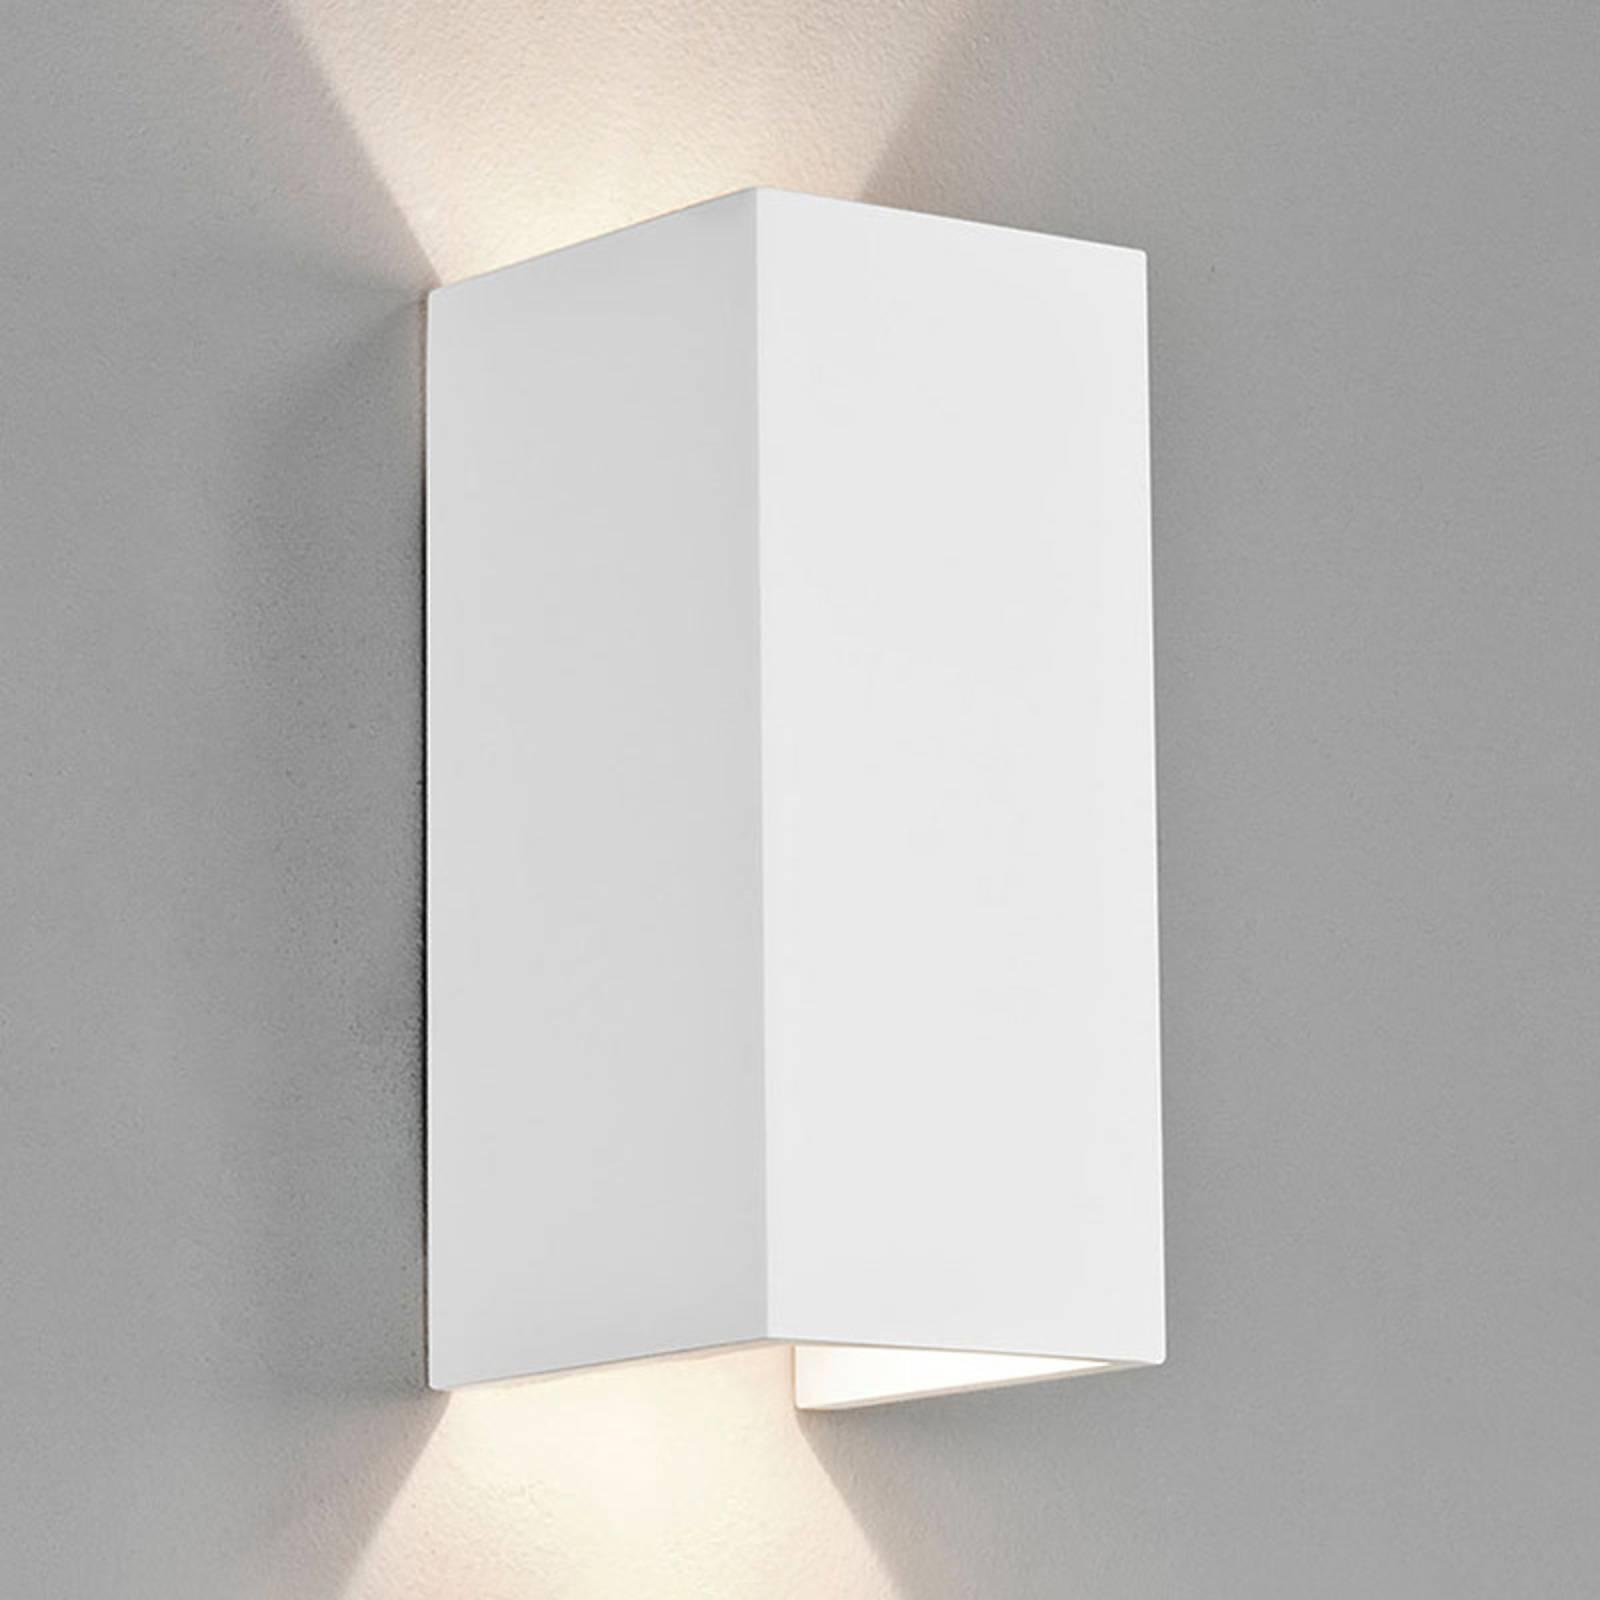 Astro Parma 210 LED Wandleuchte aus Gips, 2.700 K